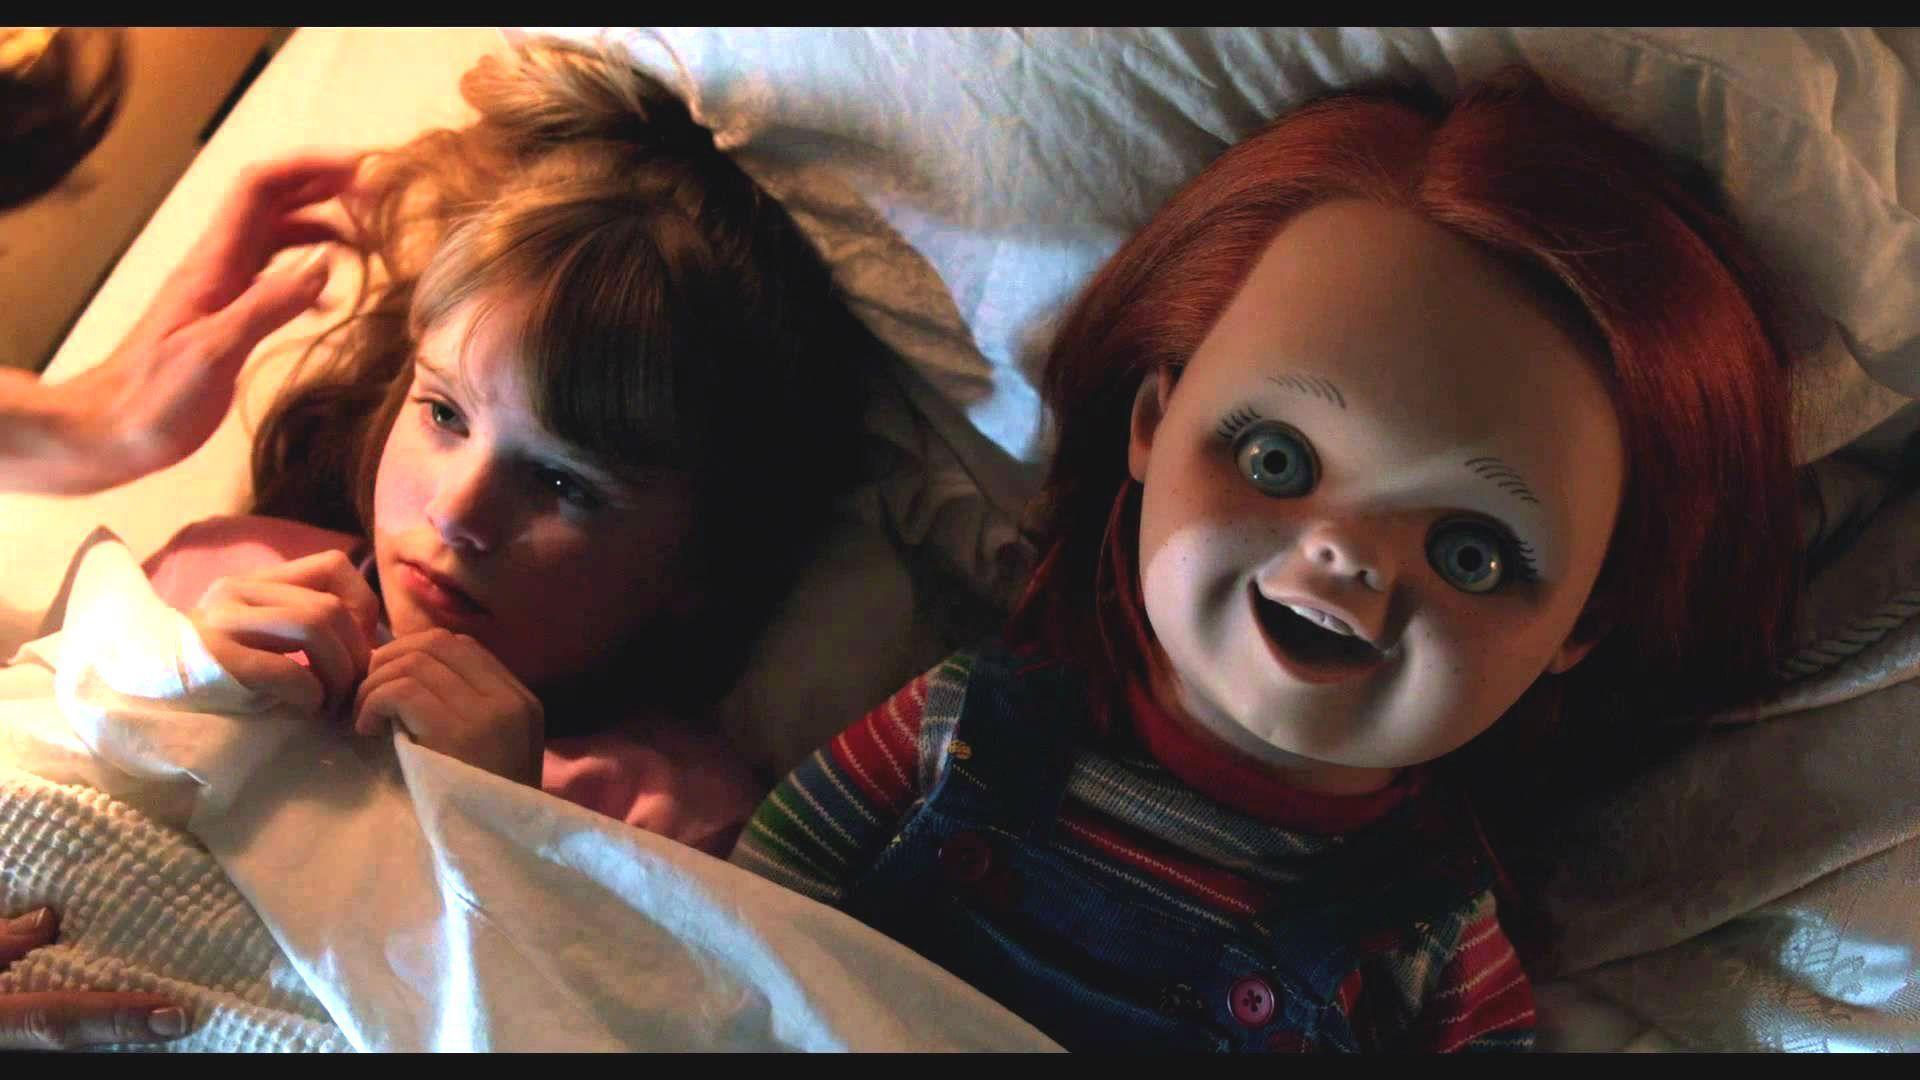 childs play chucky dark horror creepy scary (3) wallpaper